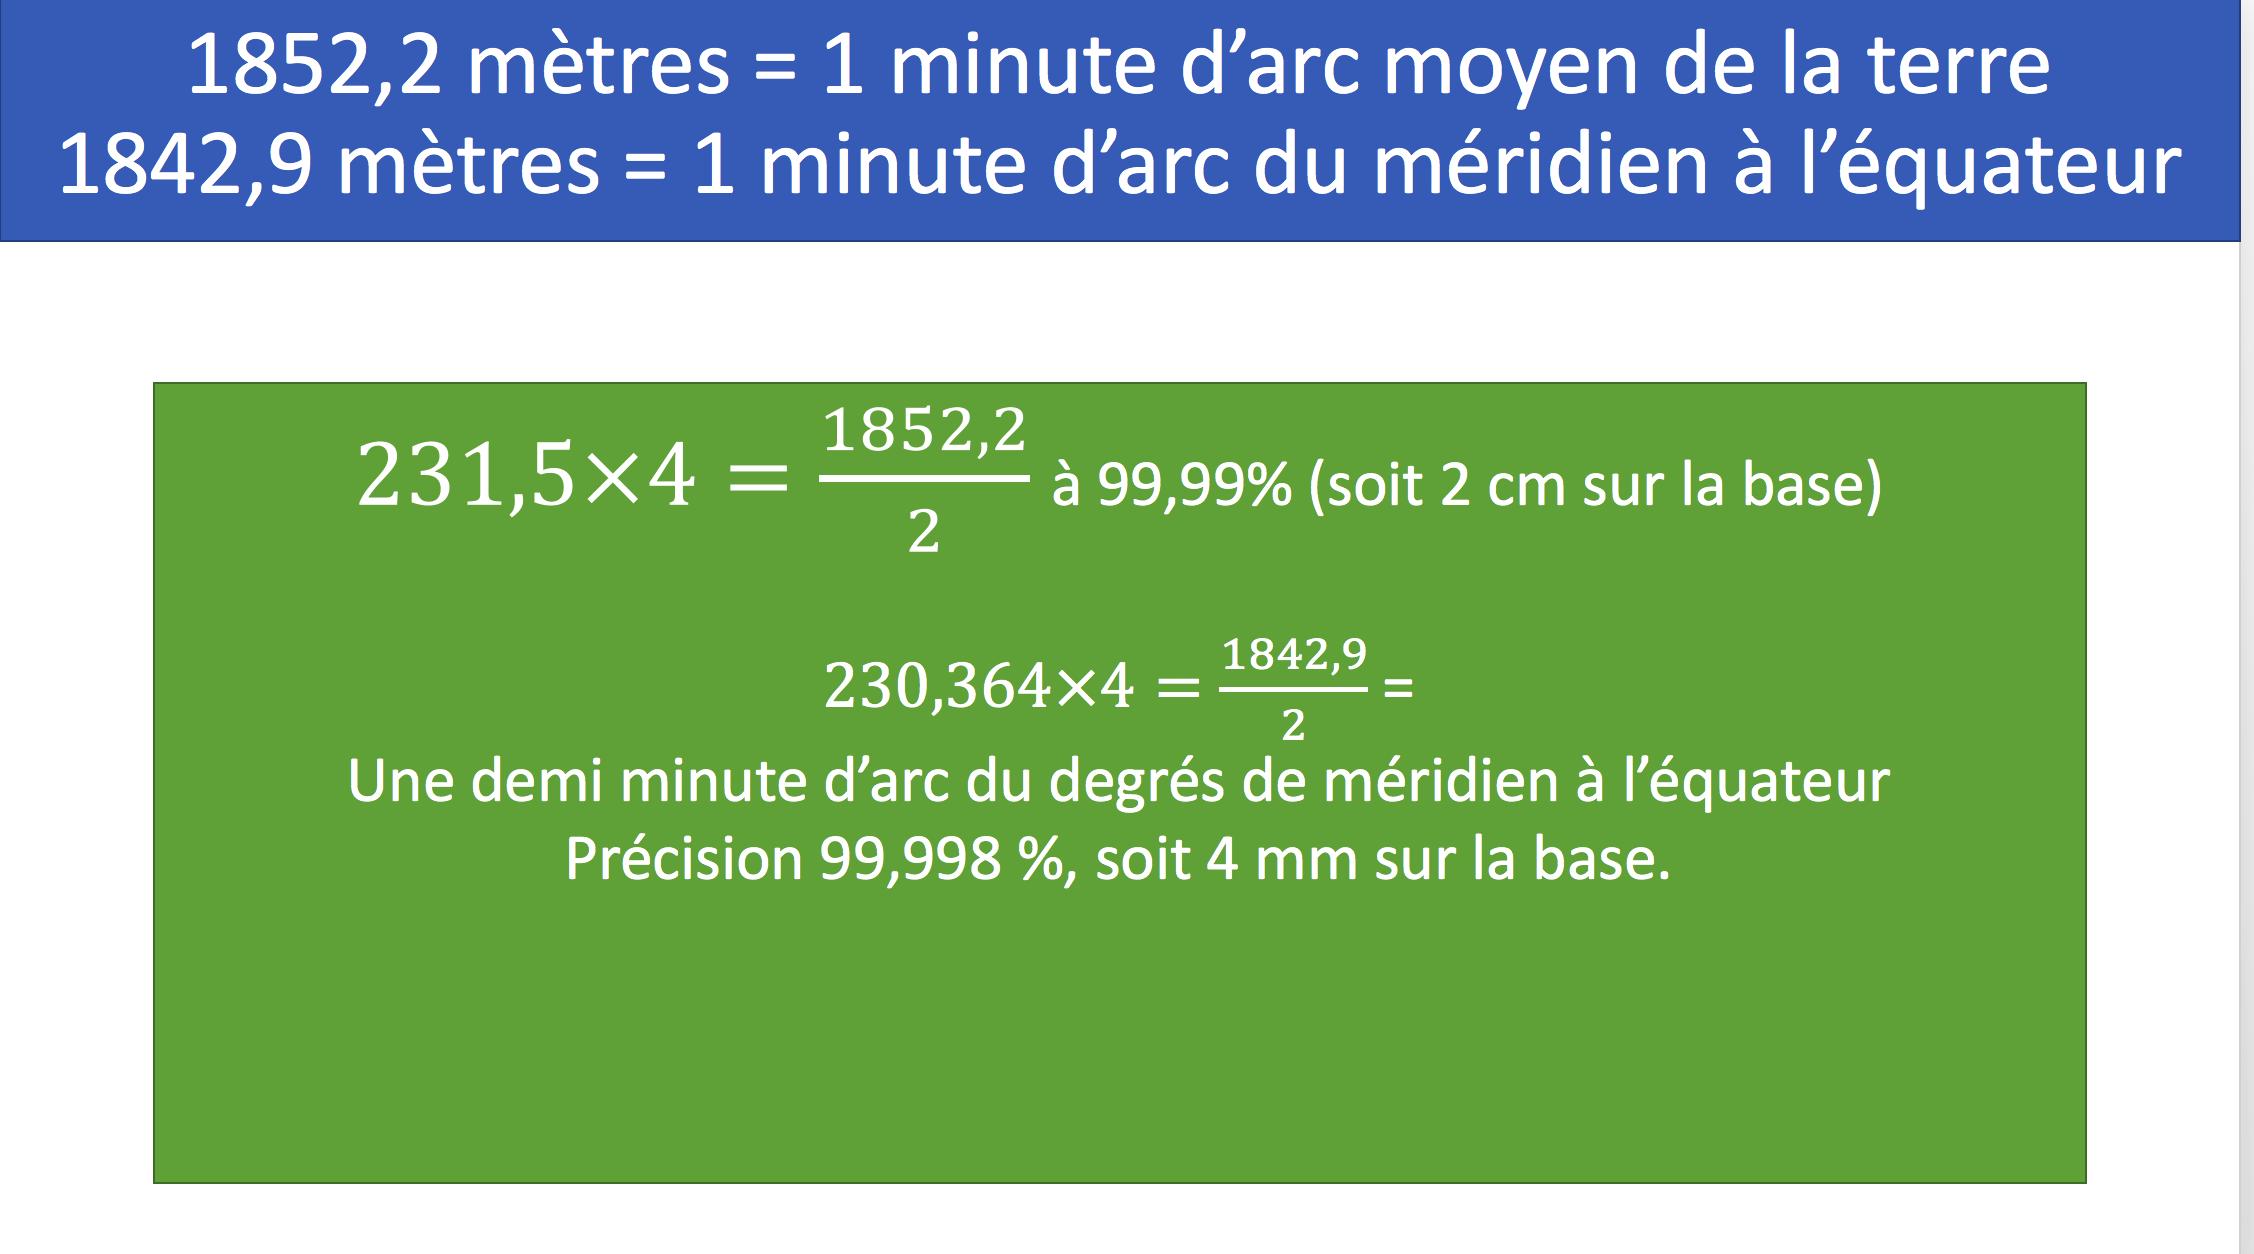 2018-02-26 21:47:34